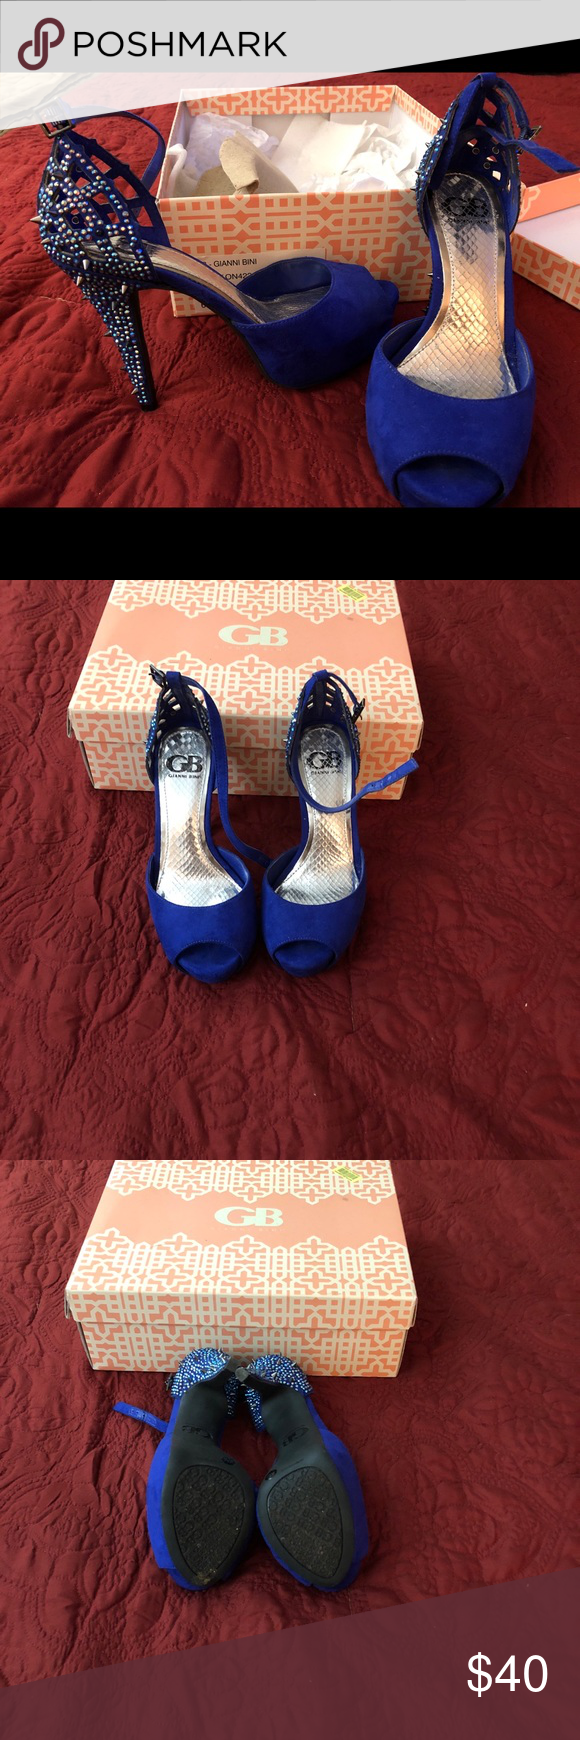 3 20 Gb Gianni Bini Sandals Women Womens Sandals Blue Sandals Gianni Bini Shoes